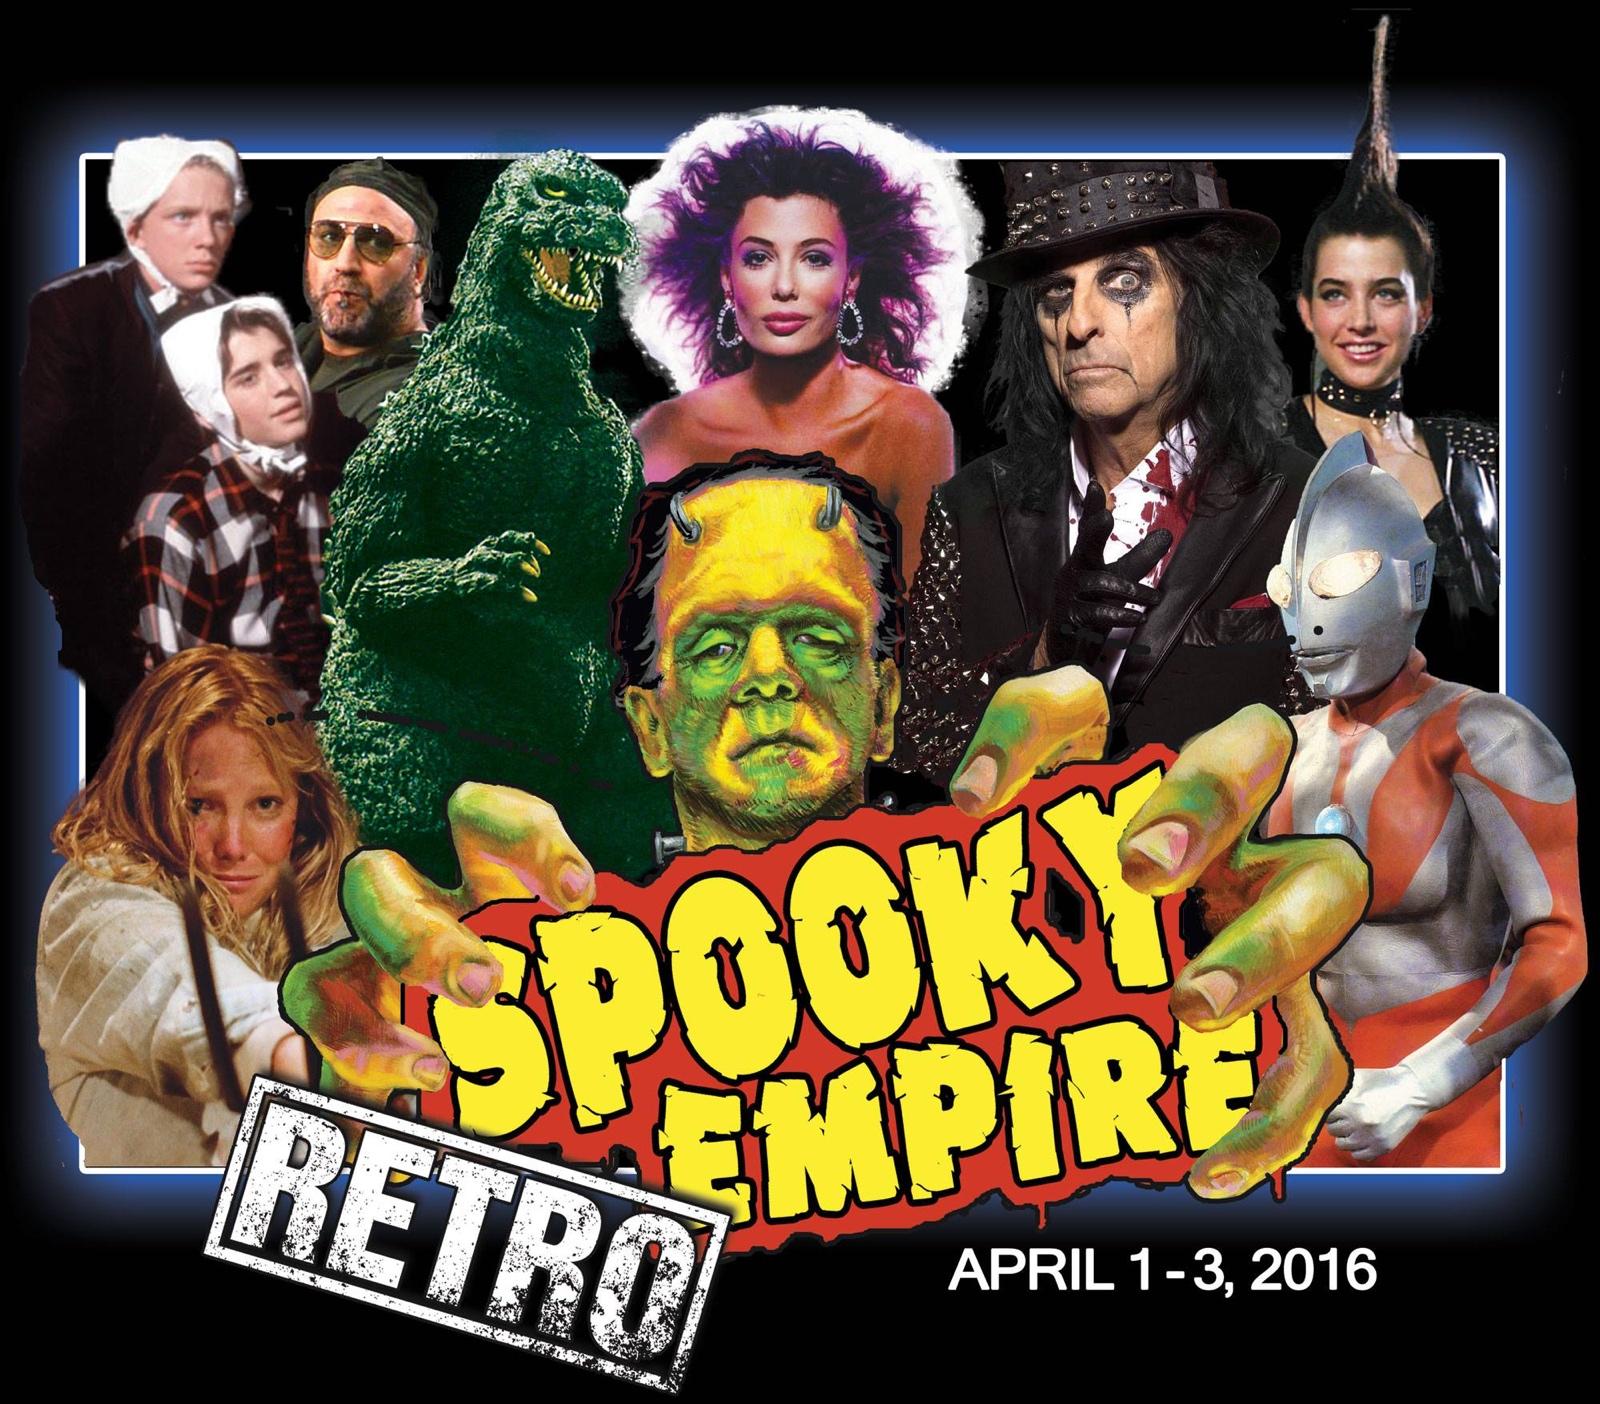 Spooky Empire Retro